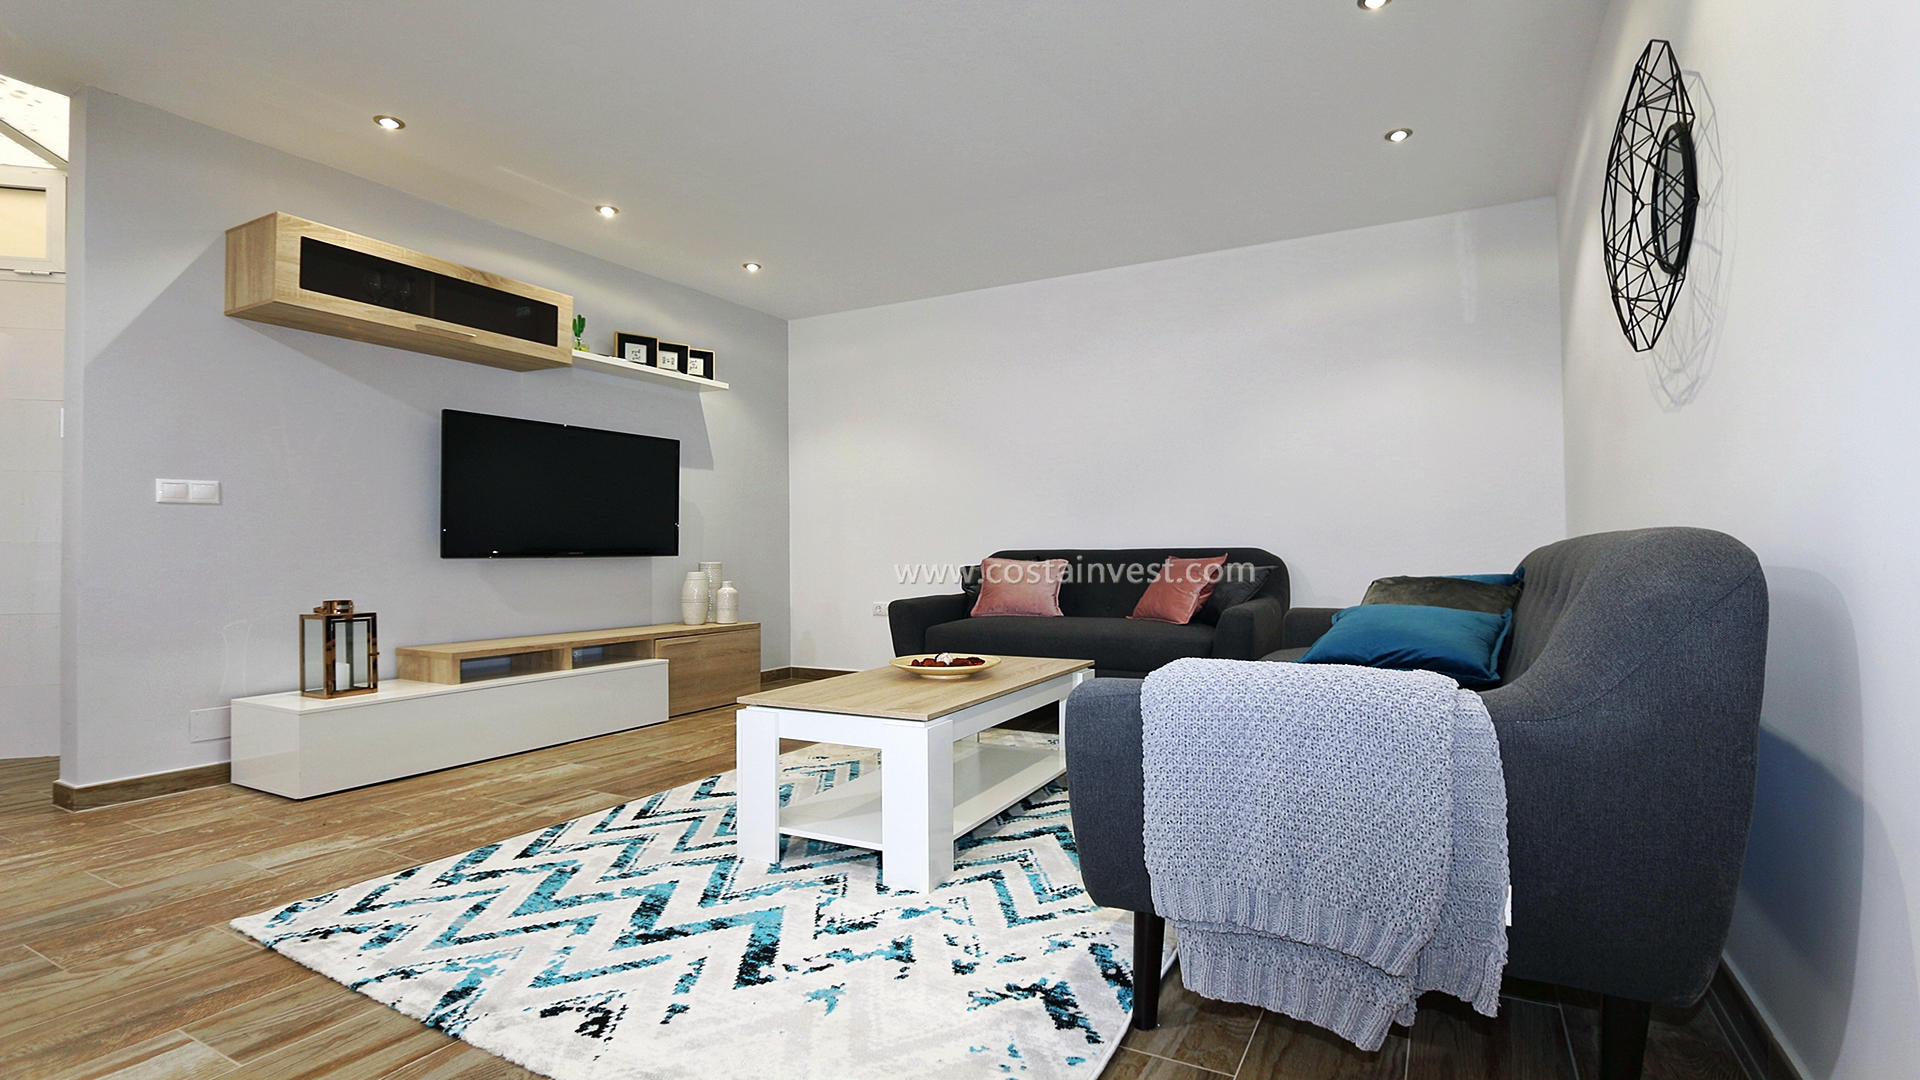 Apartament -                                       Orihuela Costa -                                       2 sypialnie -                                       4 osoby